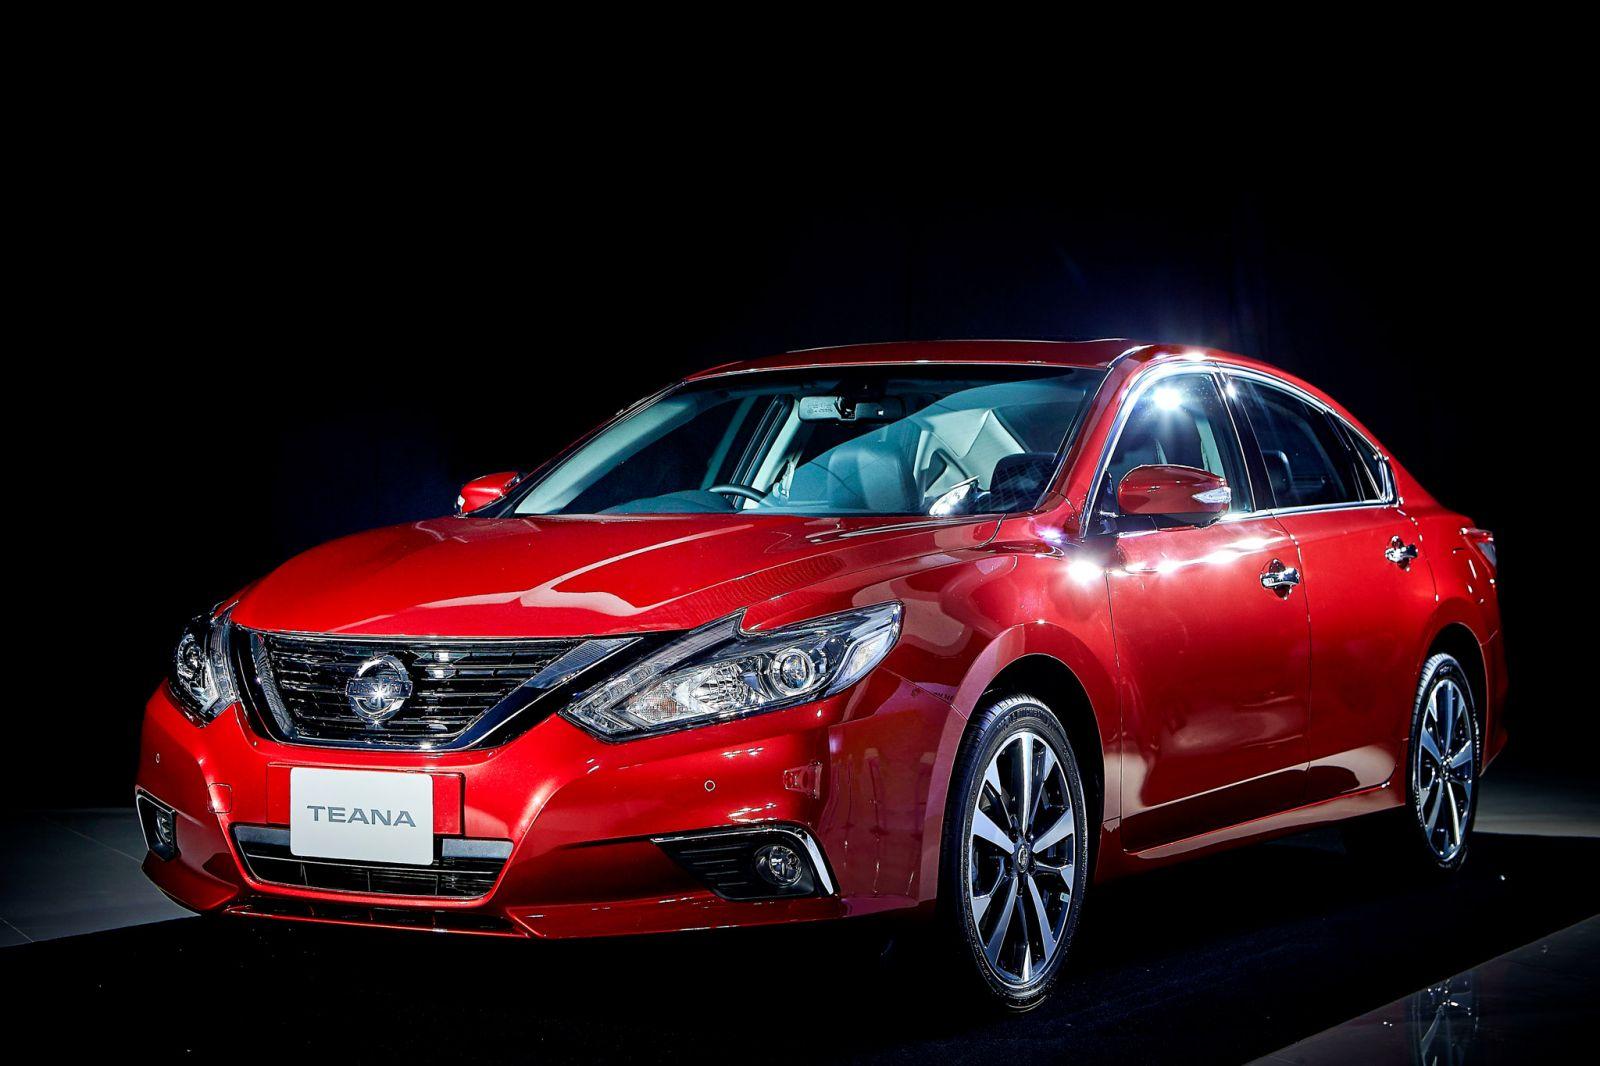 New Nissan Teana2019